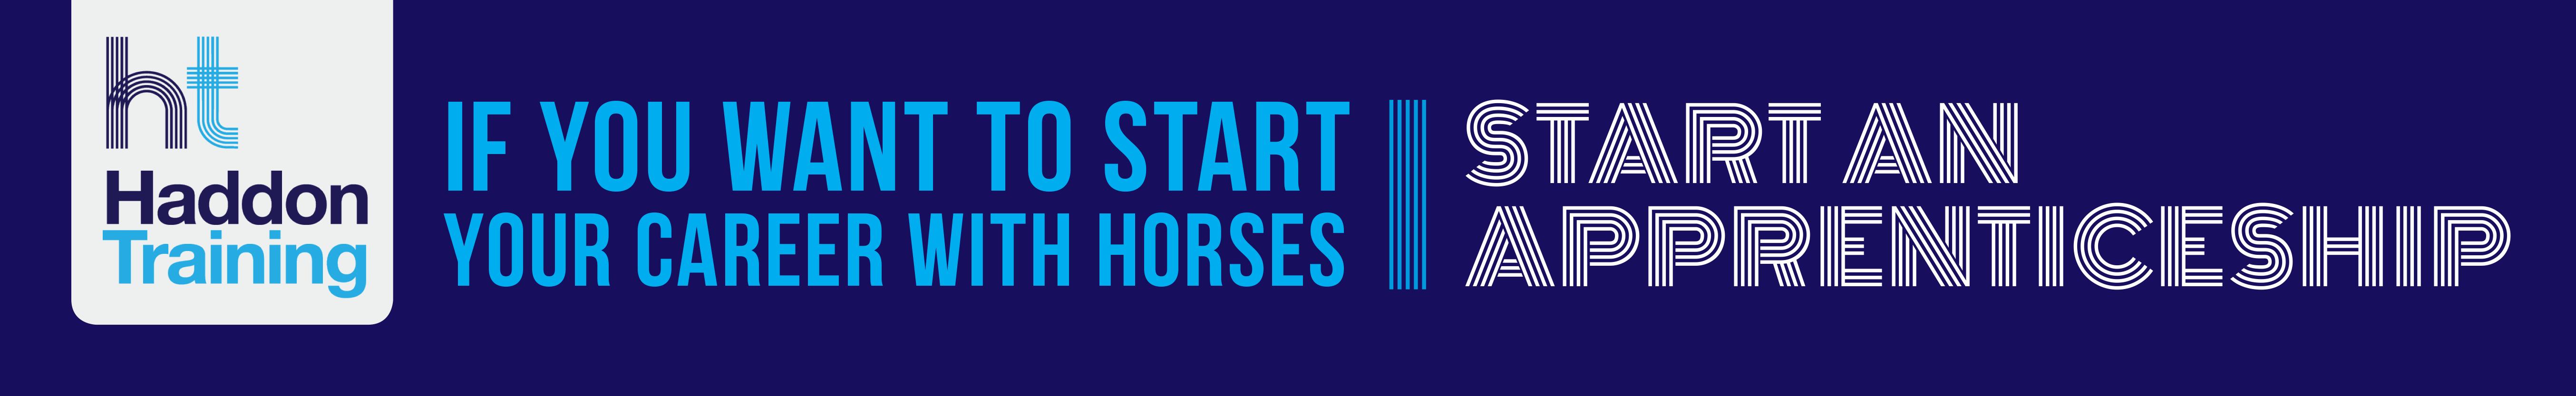 List of Vacancies: Find Your Perfect Equestrian Job | Grooms